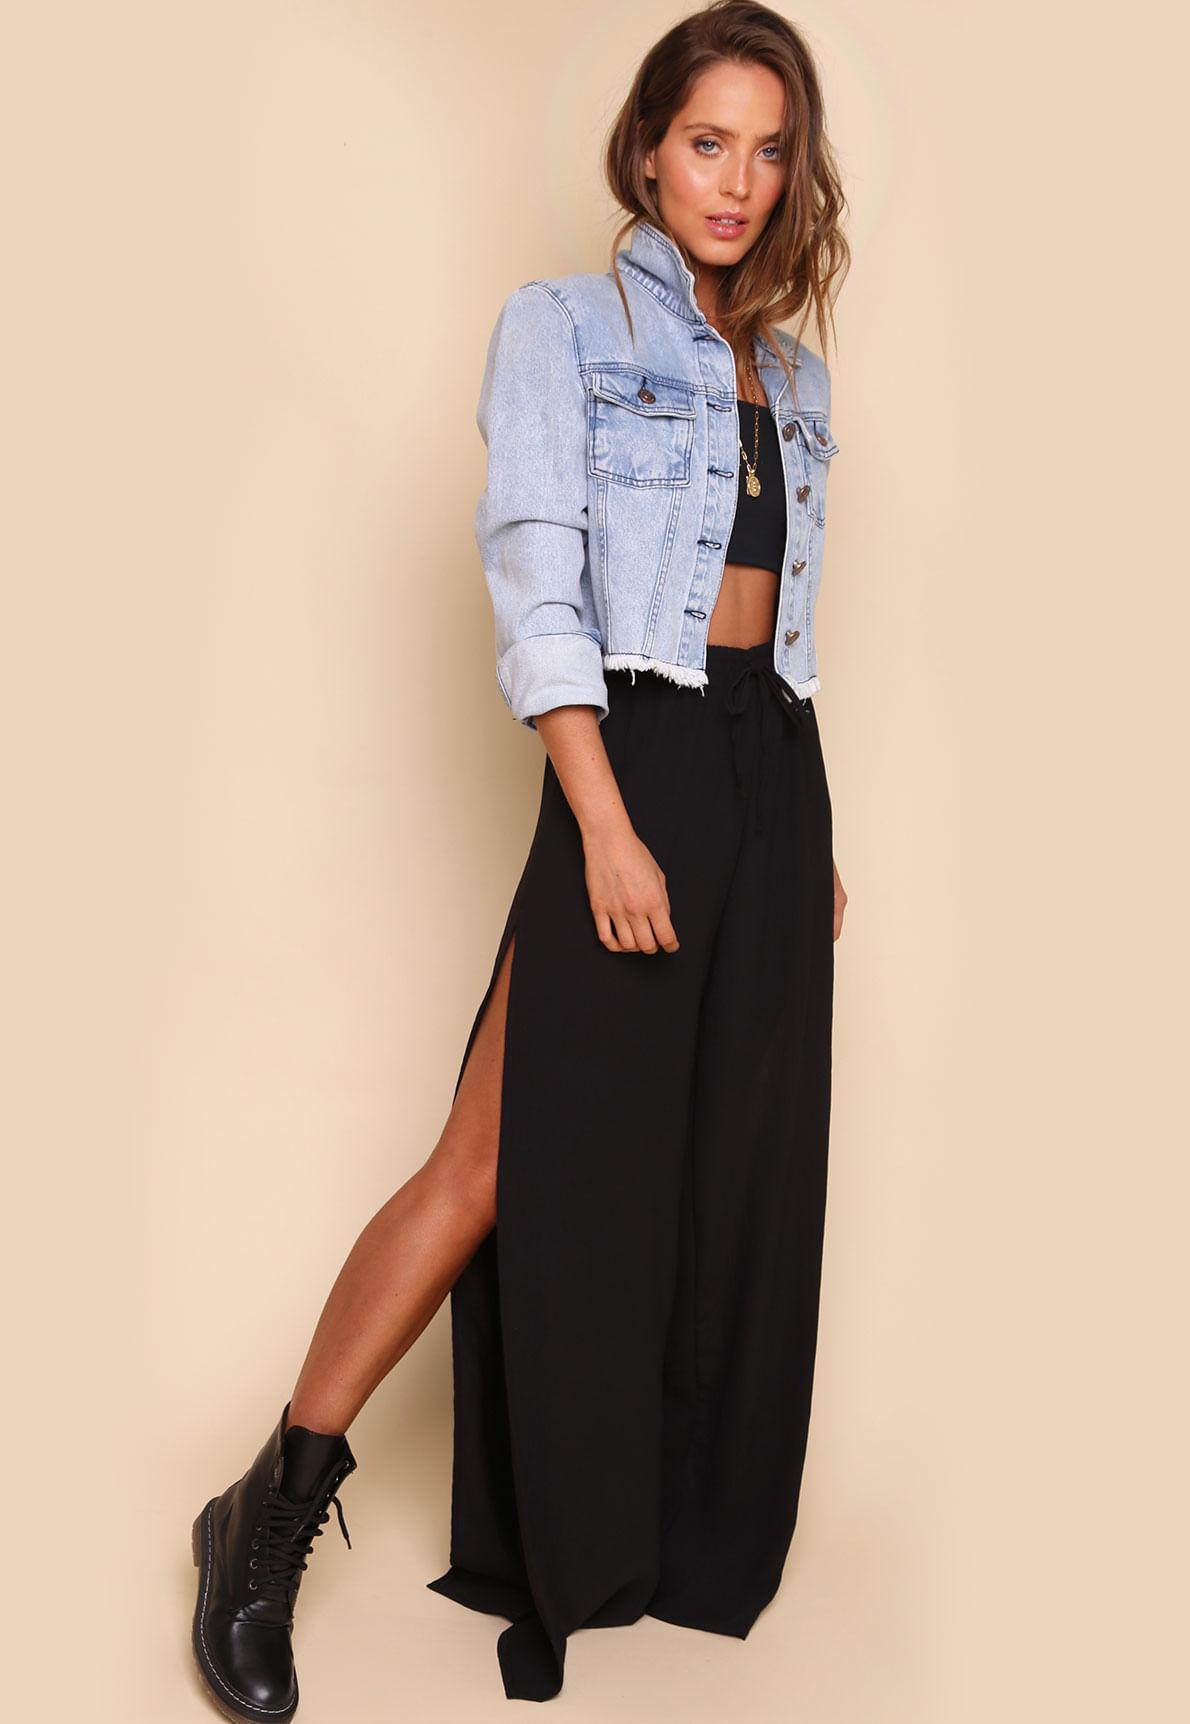 31314-calca-pantalona-fendas-belle-06